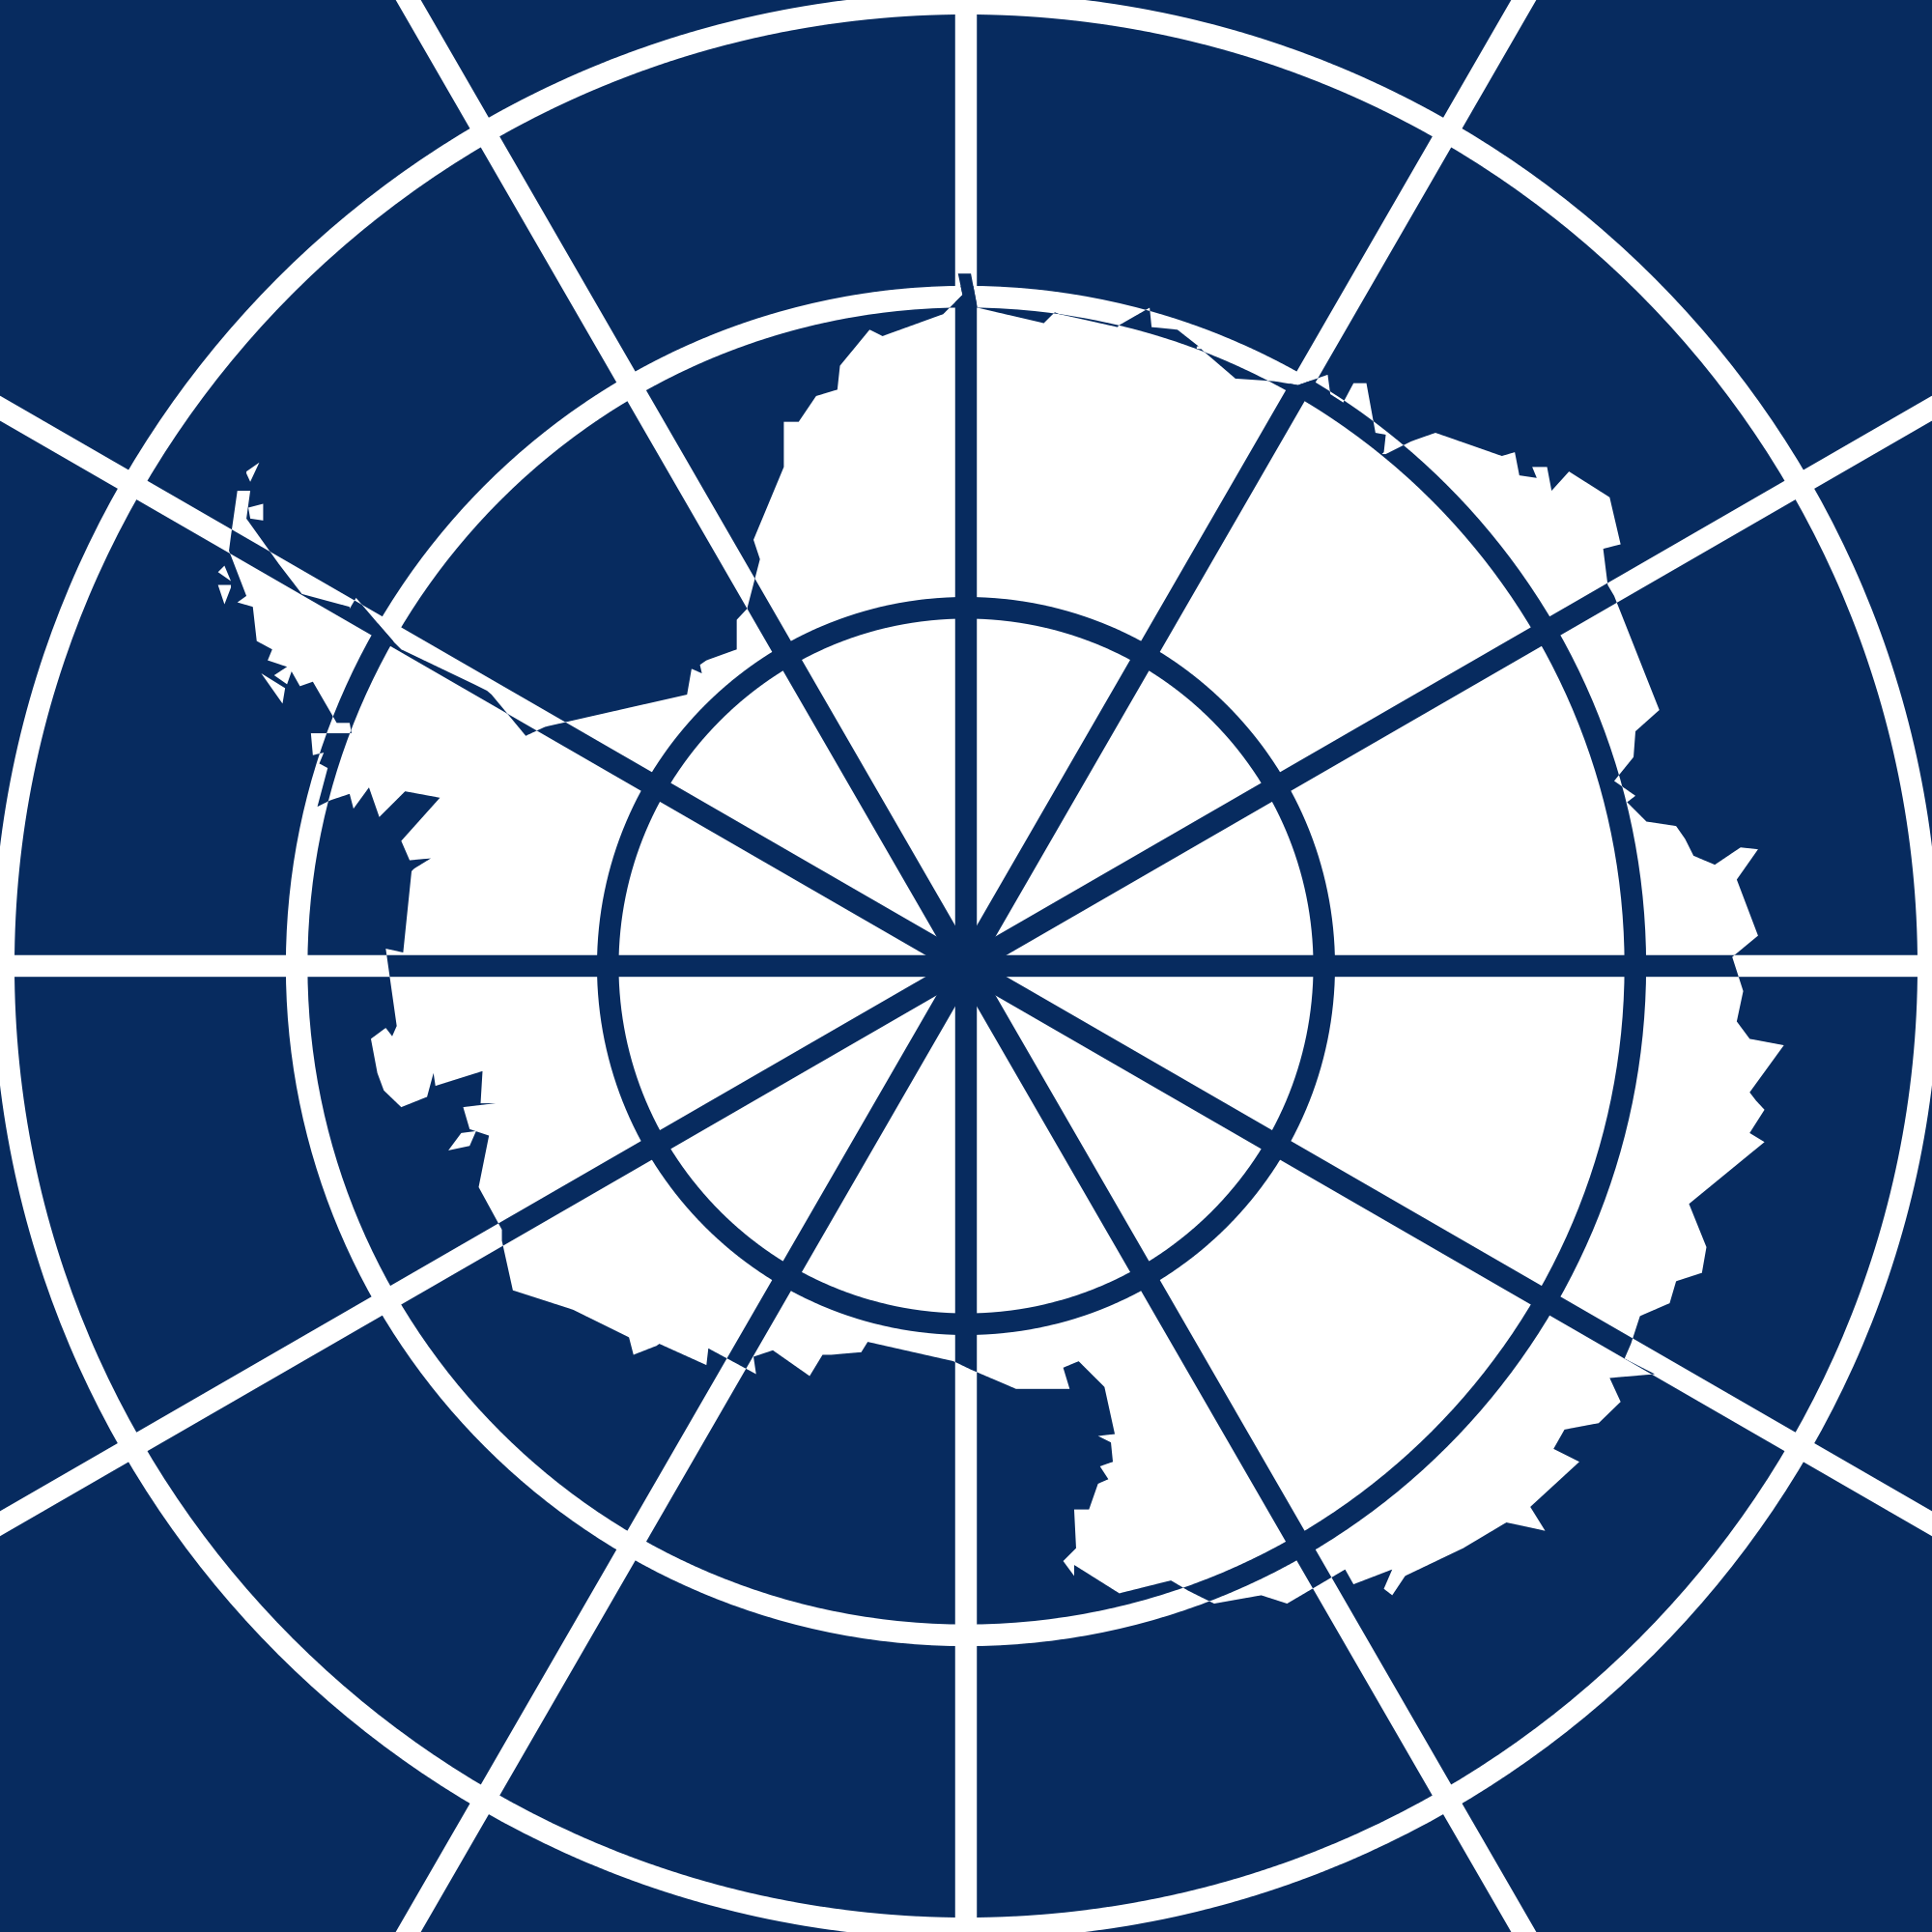 Antartide, paese, emblema, logo, simbolo - Sfondi HD - Professor-falken.com